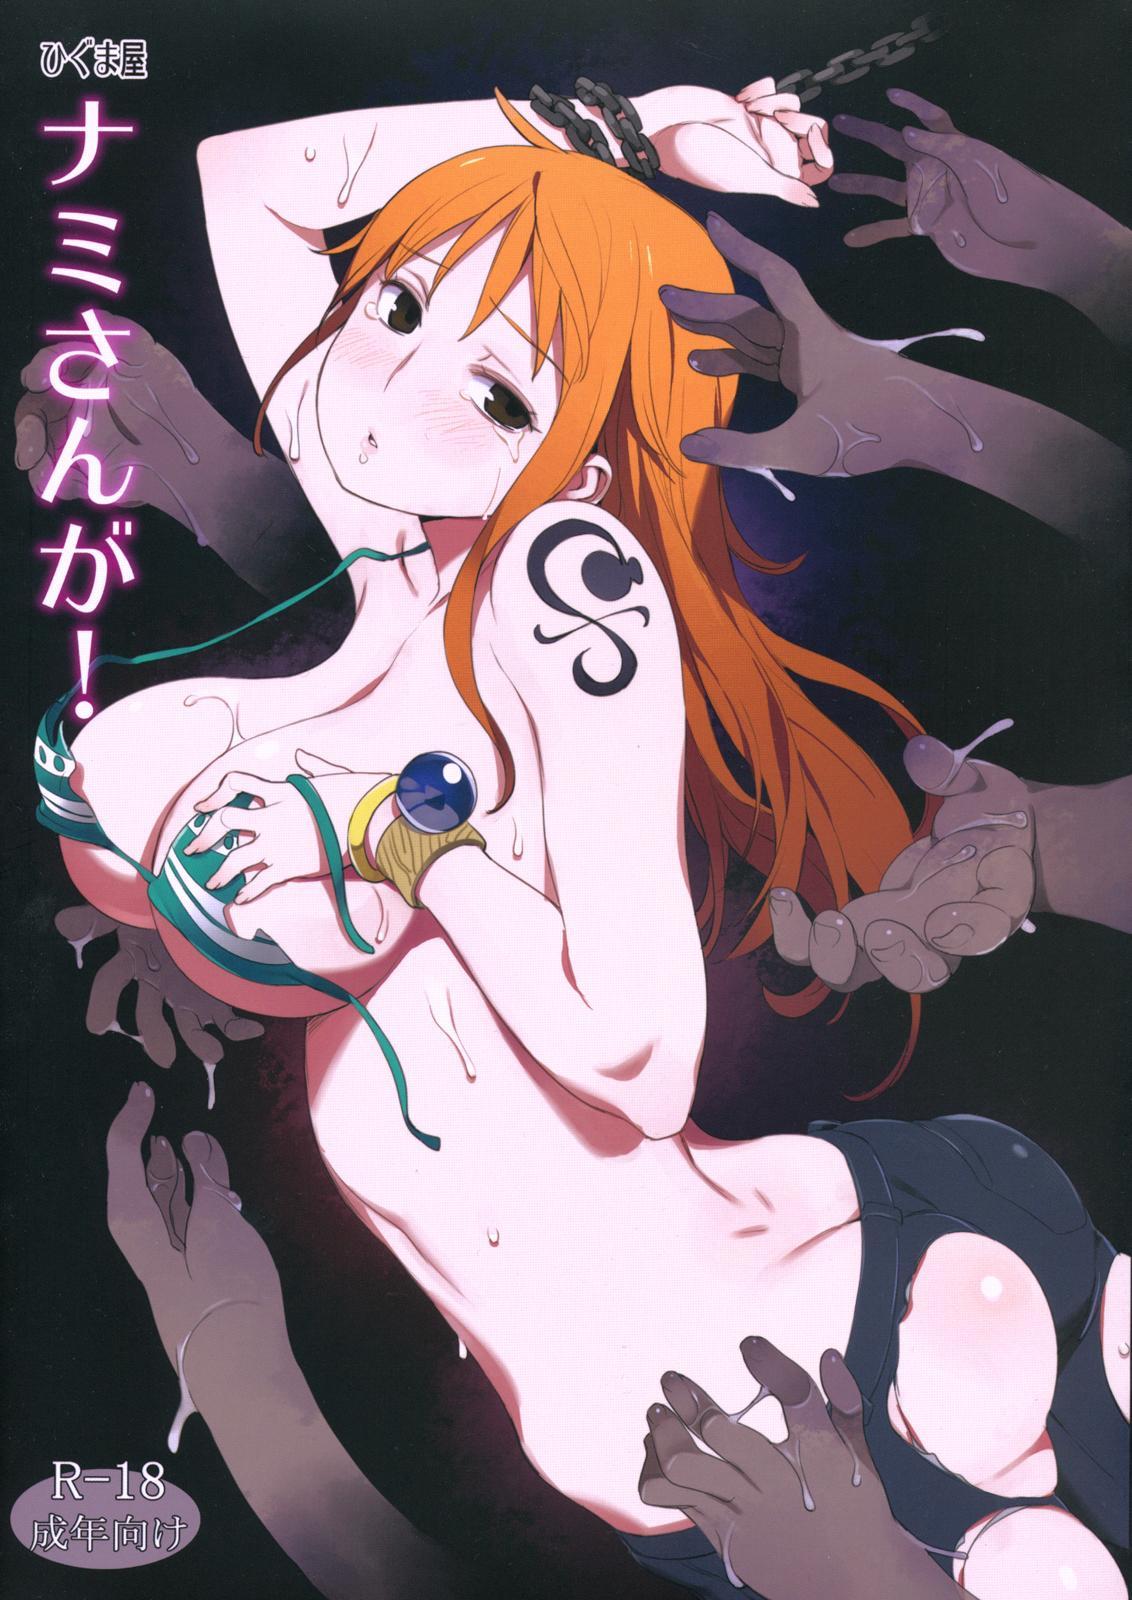 (C81) [Higuma-ya (Nora Higuma)] Nami-san ga! (One Piece) [English] colorized (incomplete) 0